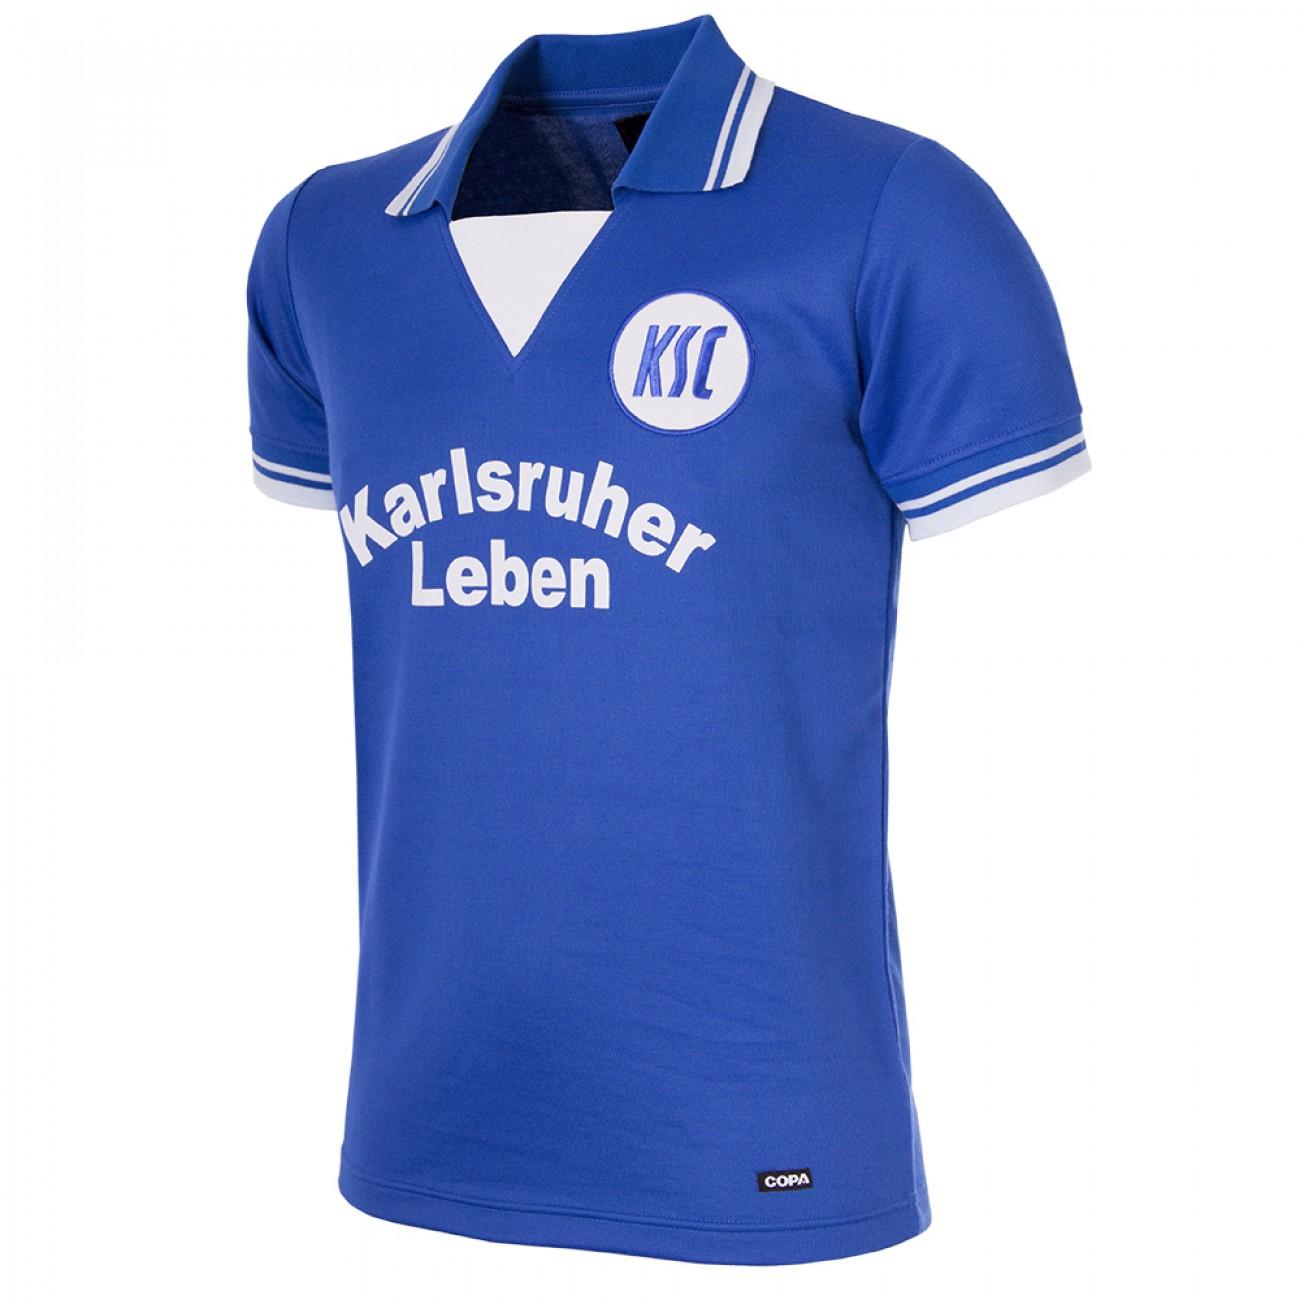 http://www.retrofootball.es/ropa-de-futbol/camiseta-karlsruher-1977-78.html